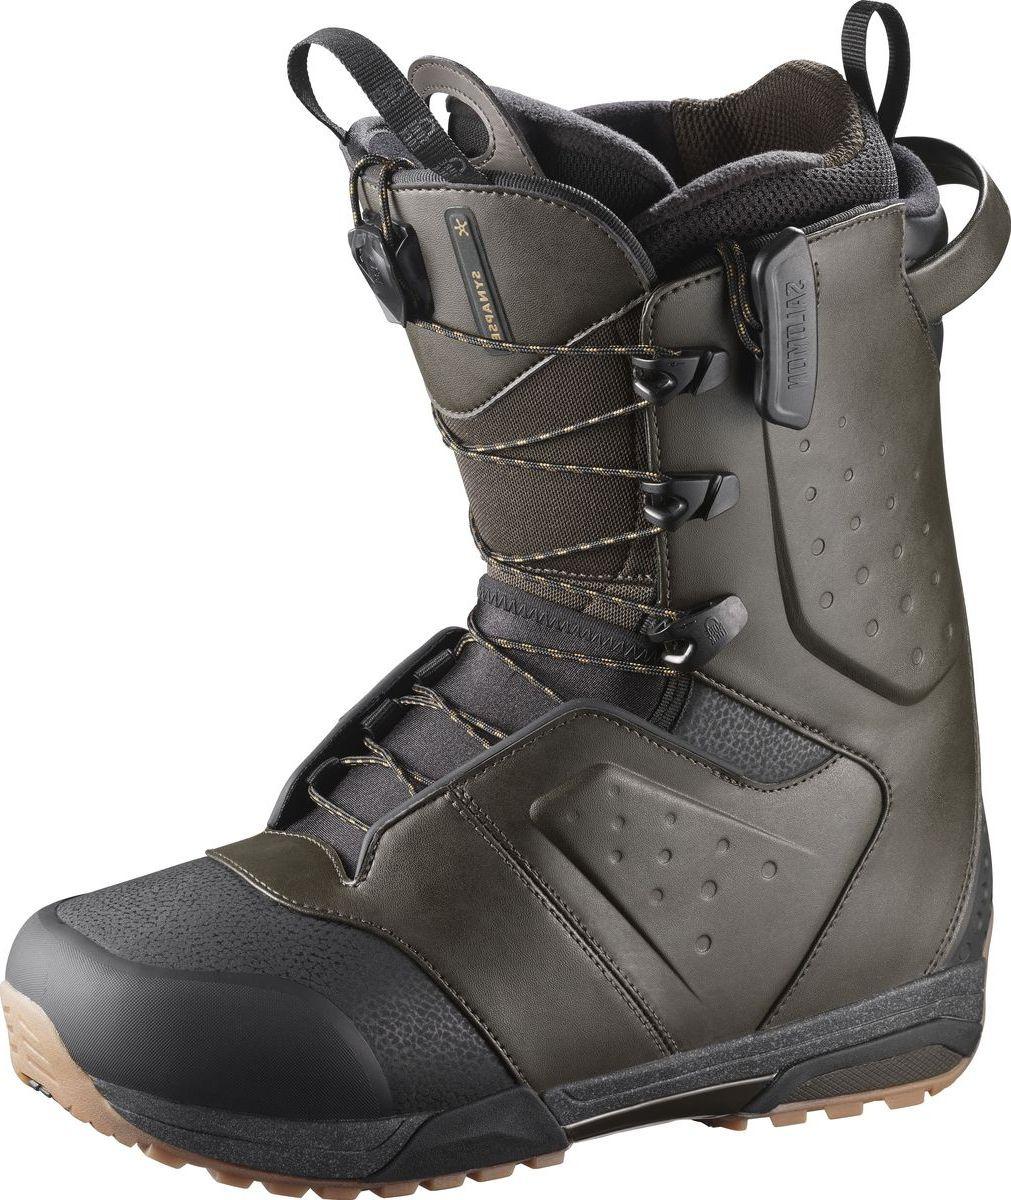 "Ботинки для сноуборда Salomon ""Synapse"", цвет: темно-зеленый. Размер 28,5 (43,5)"